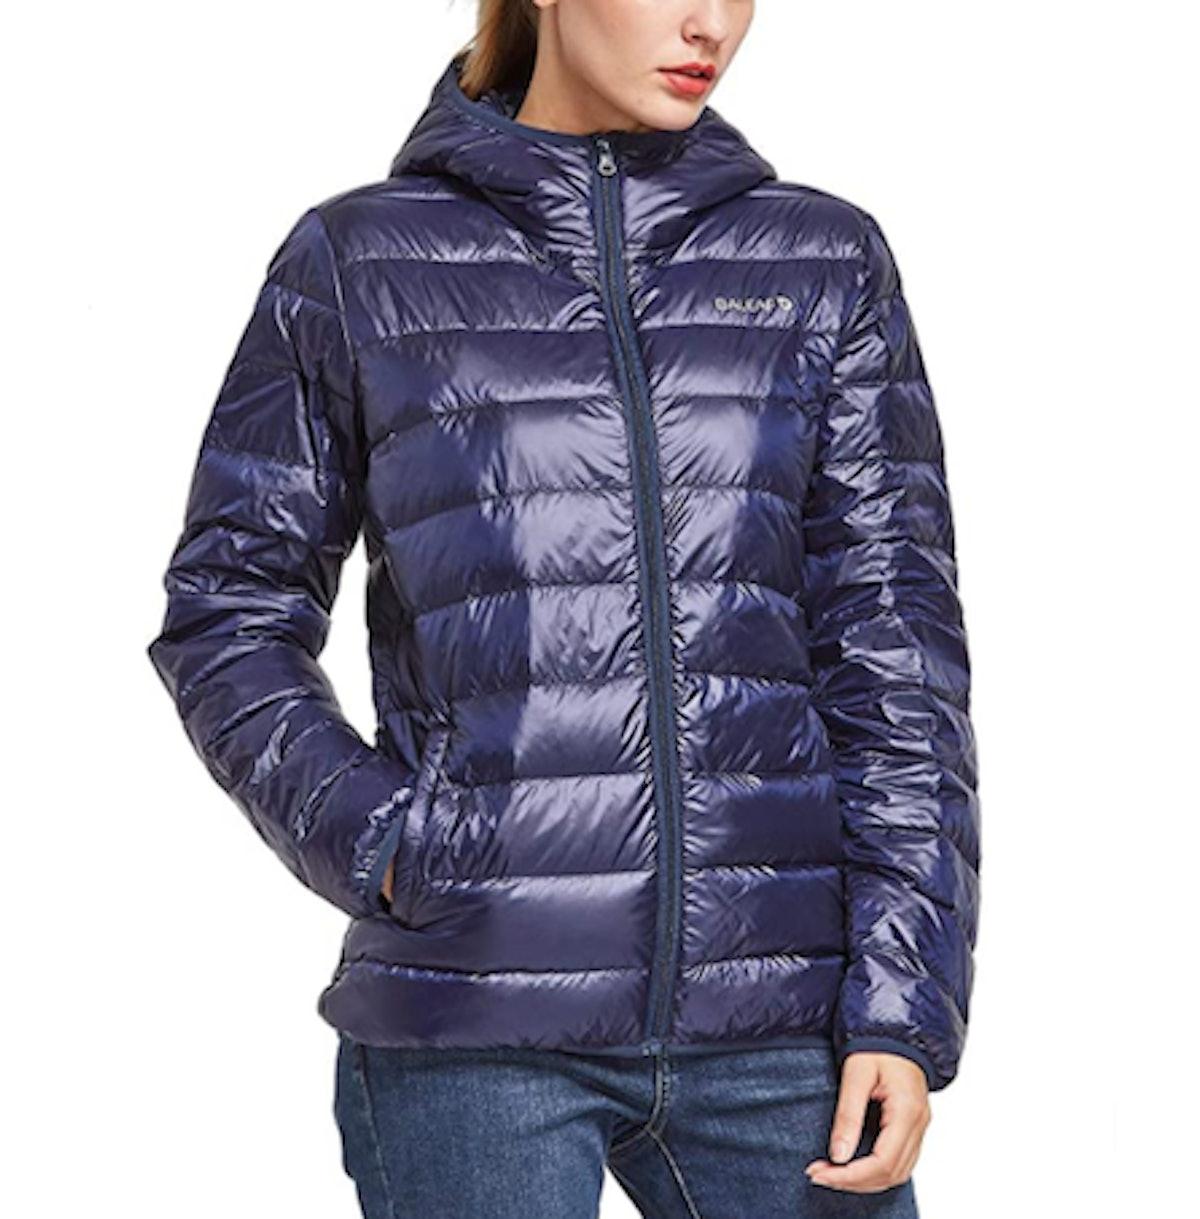 BALEAF Women's Packable Down Jacket